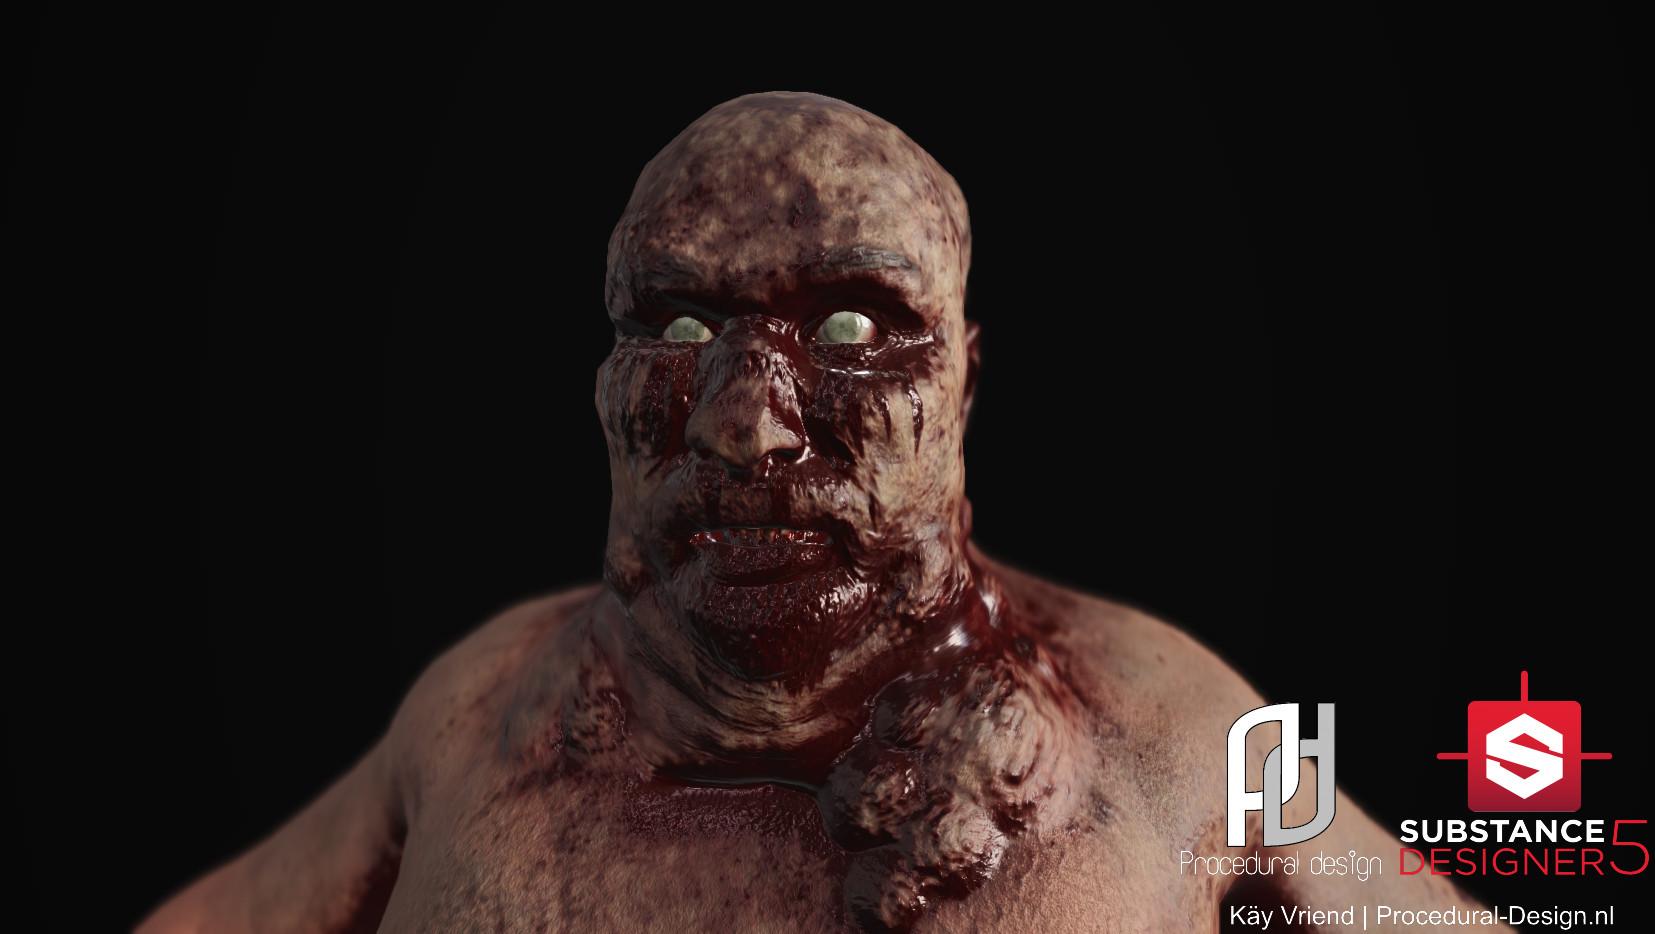 Kay vriend zombie 10